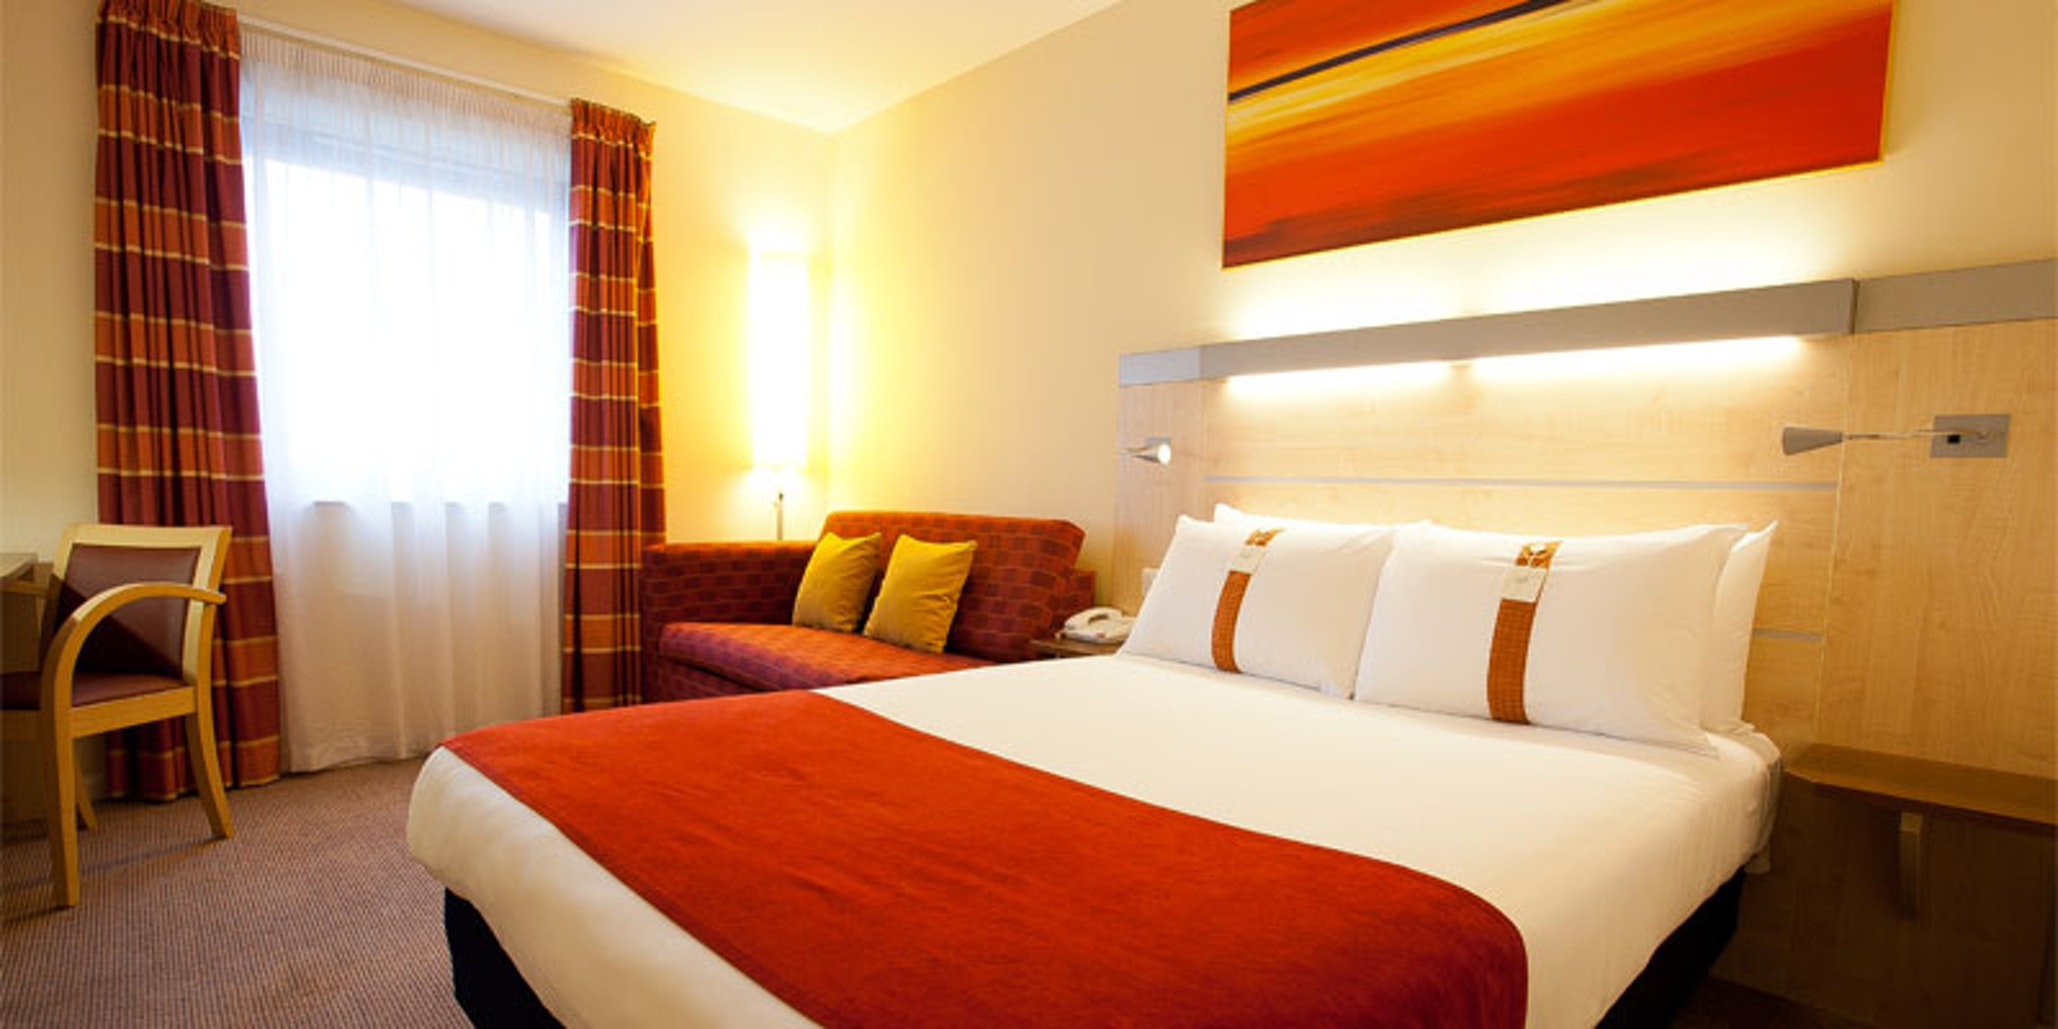 Holiday Inn Express, Slough near LEGOLAND Windsor Resort